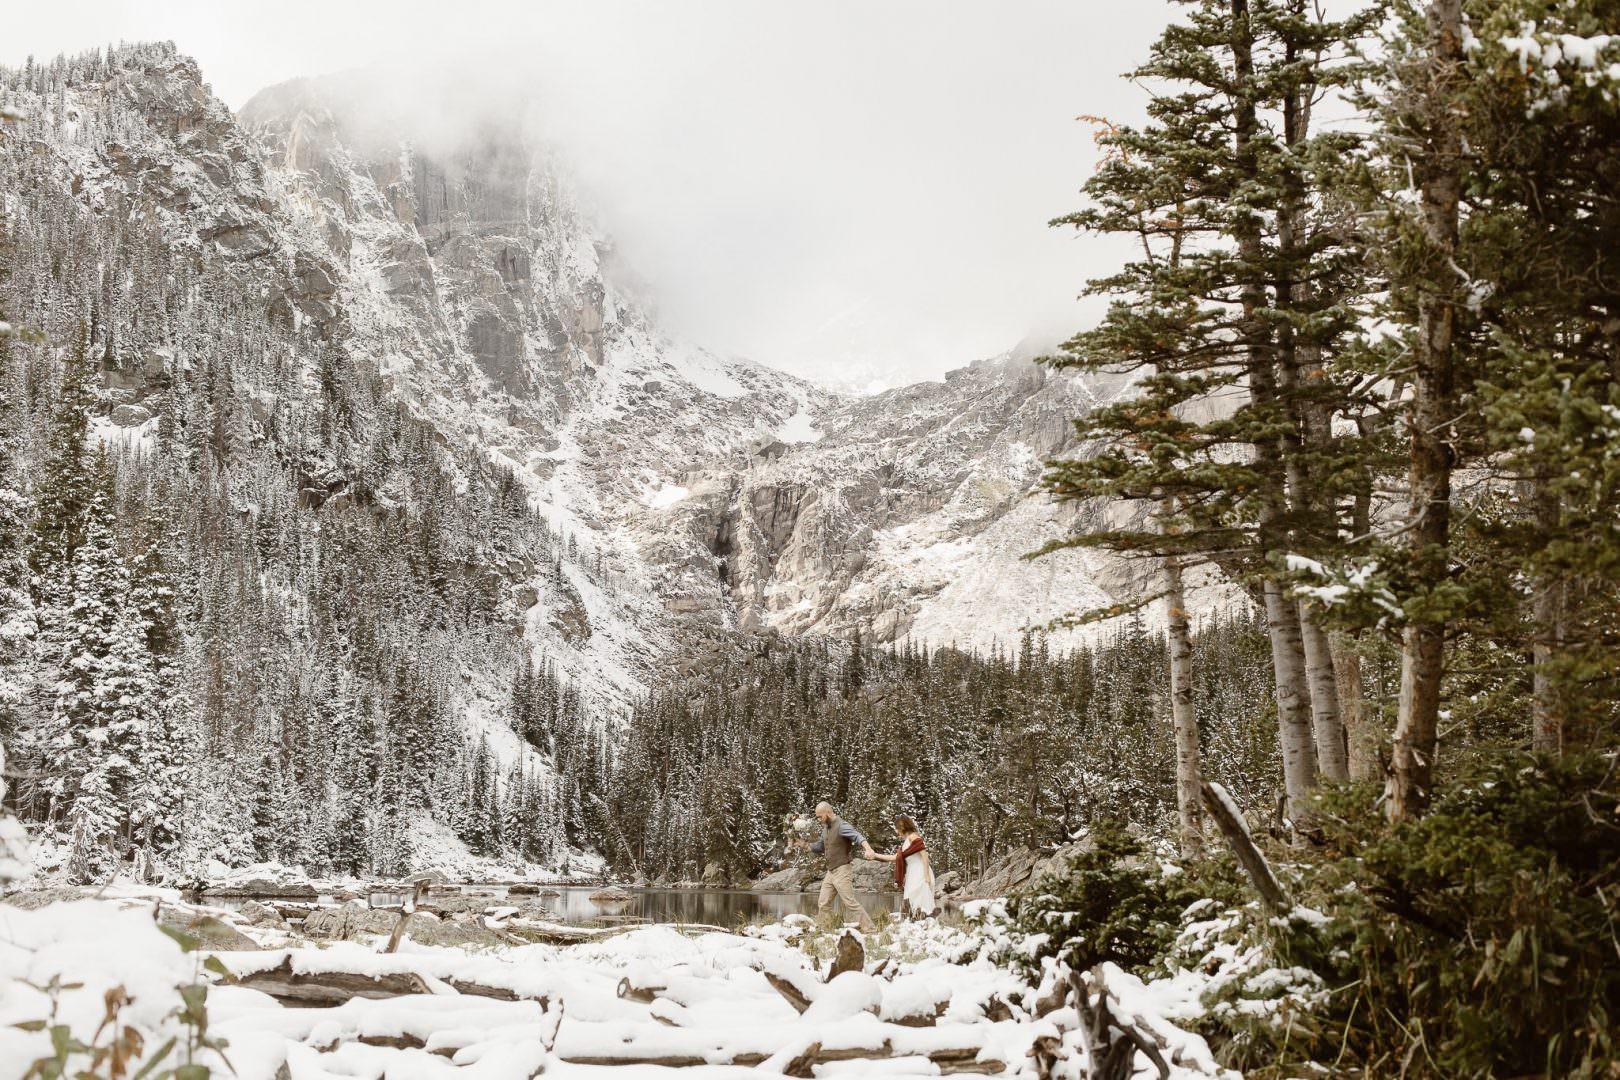 colorado-adventure-elopement-photographer-adventure-weddings-rocky-mountain-adventures-justyna-e-butler